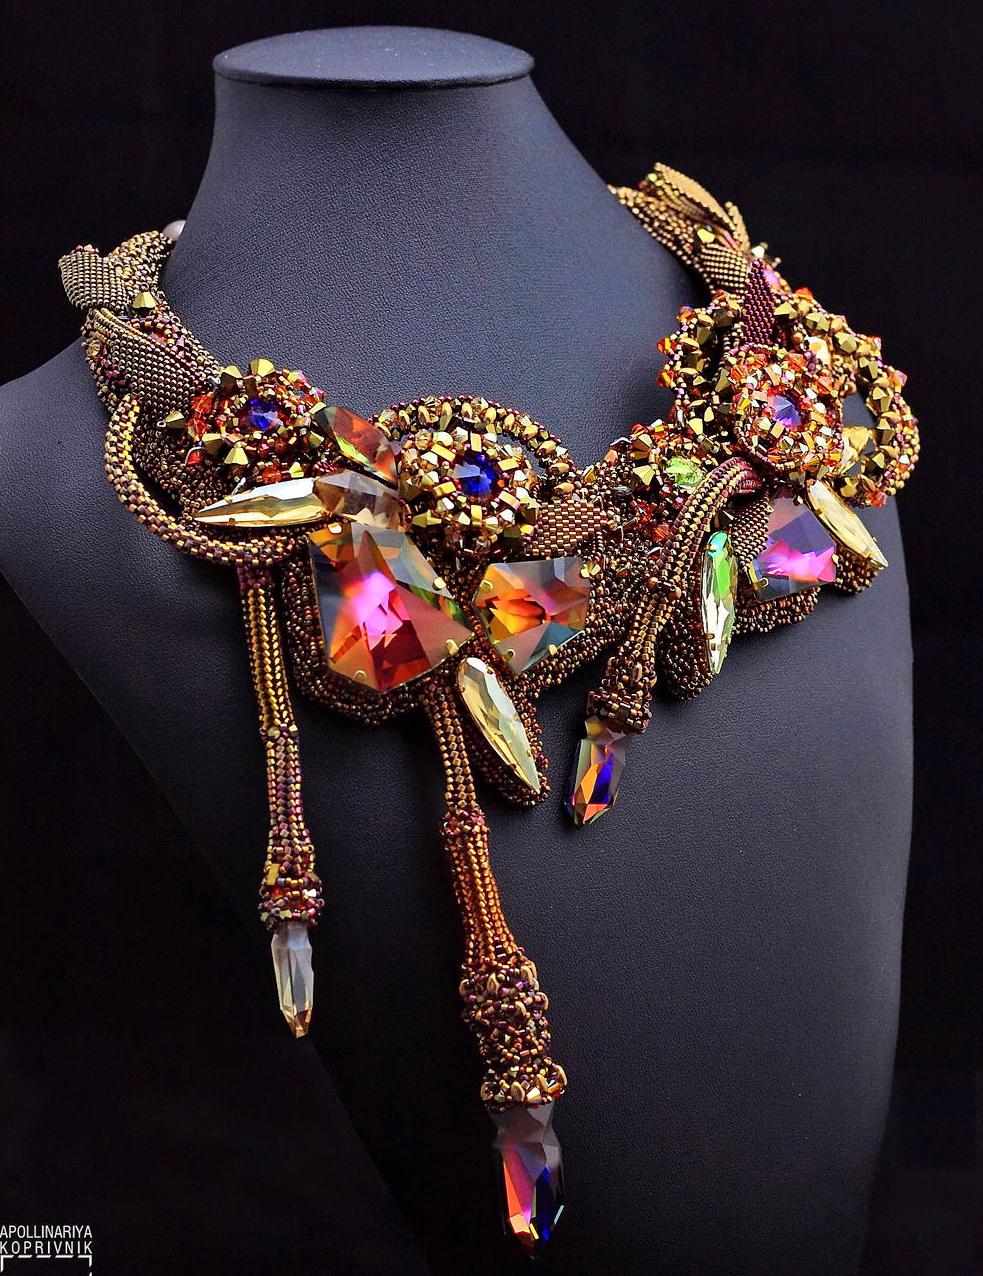 Amazing beaded jewelry by Pikapolina